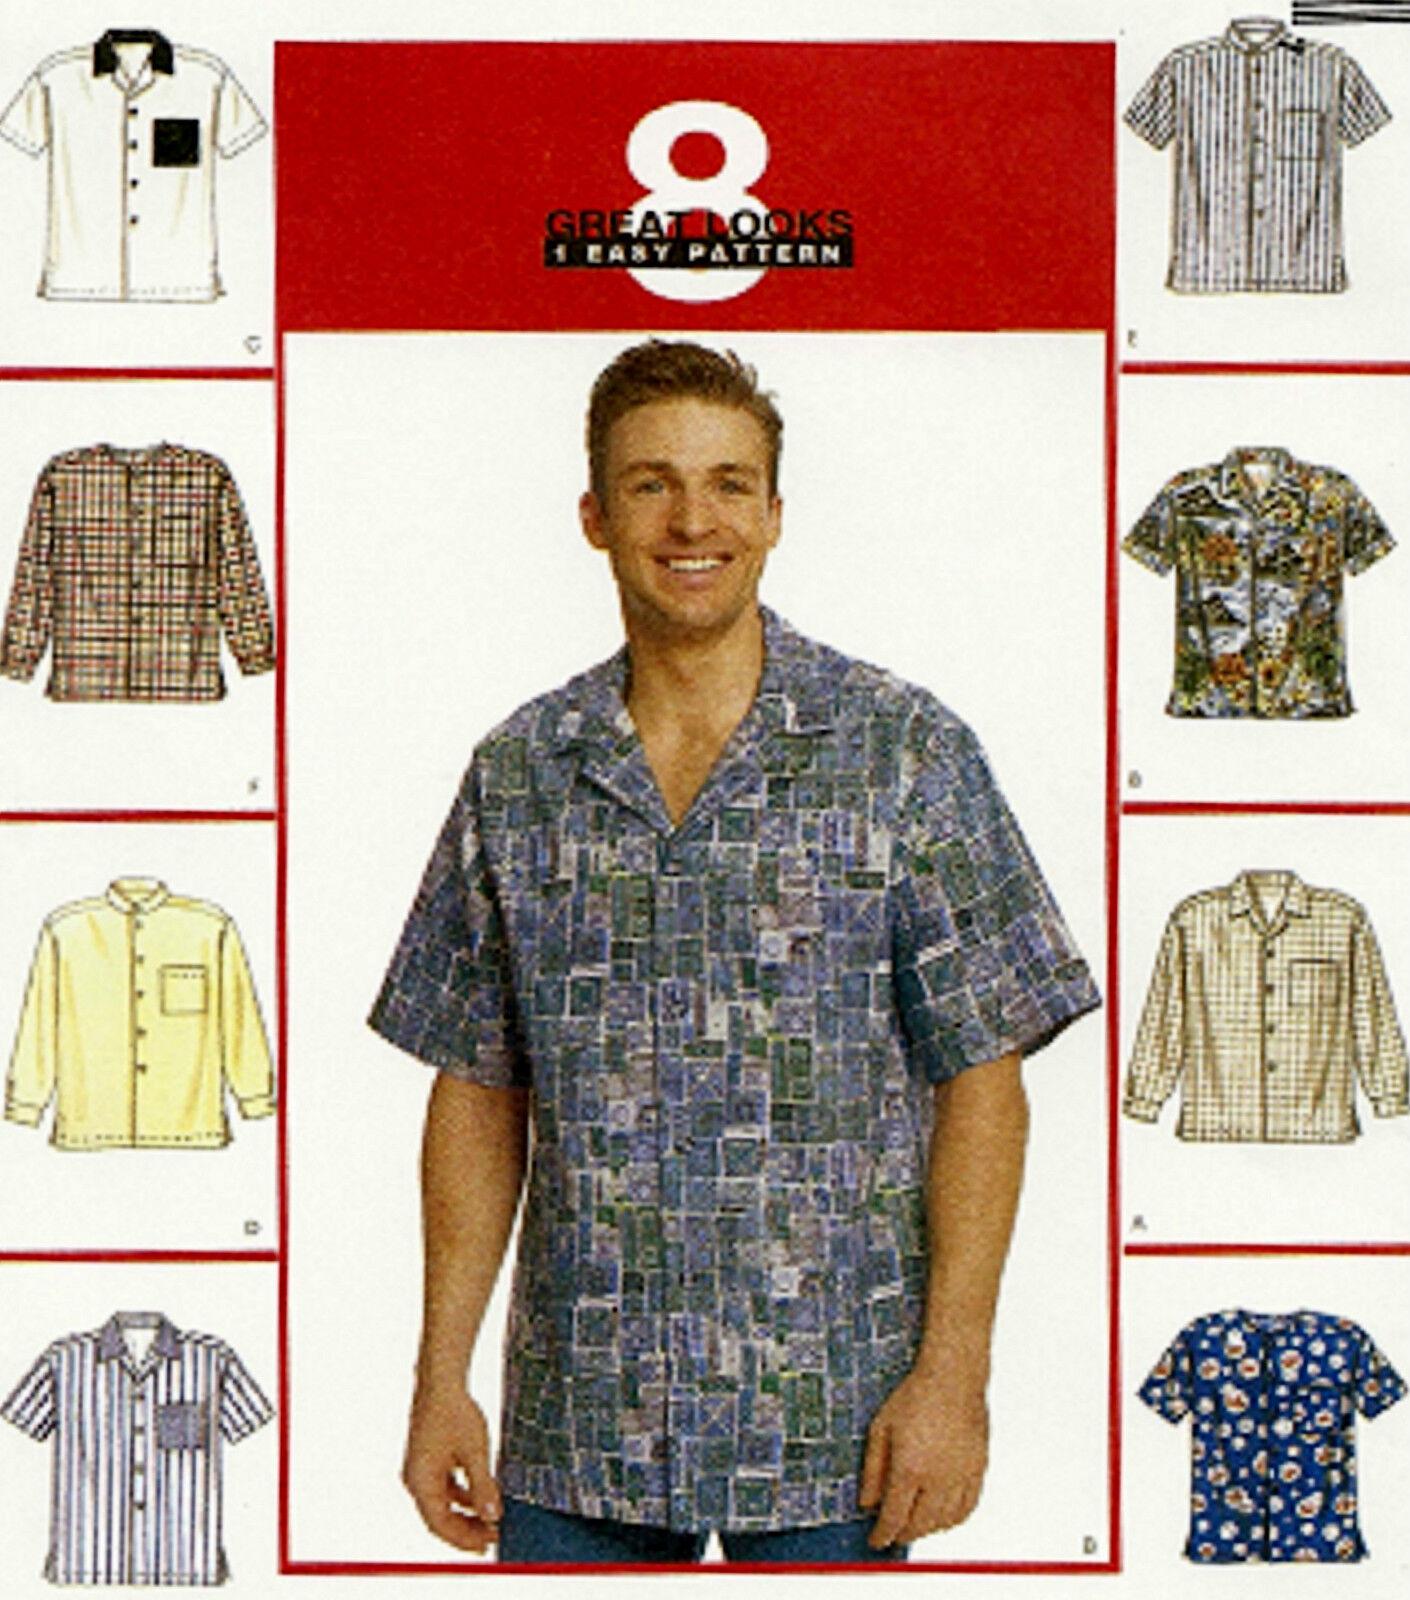 BRAND Mens Plus Size 50-52 2x Shirt Sewing Pattern McCalls 2149 | eBay